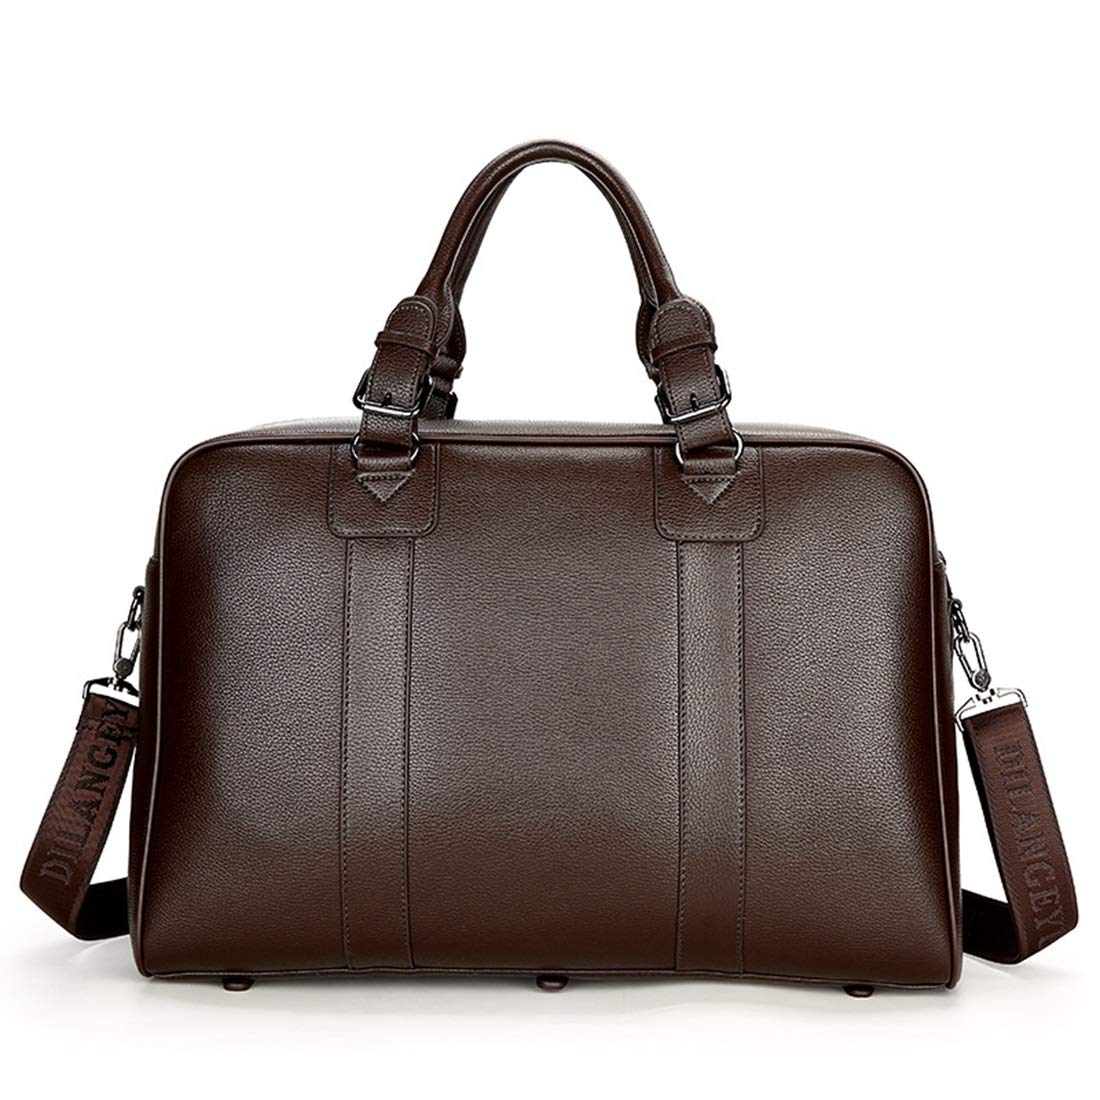 Color : Brown RABILTY Men High Capacity Handbag Business Bag Travel Bag Briefcase Short-Distance Luggage